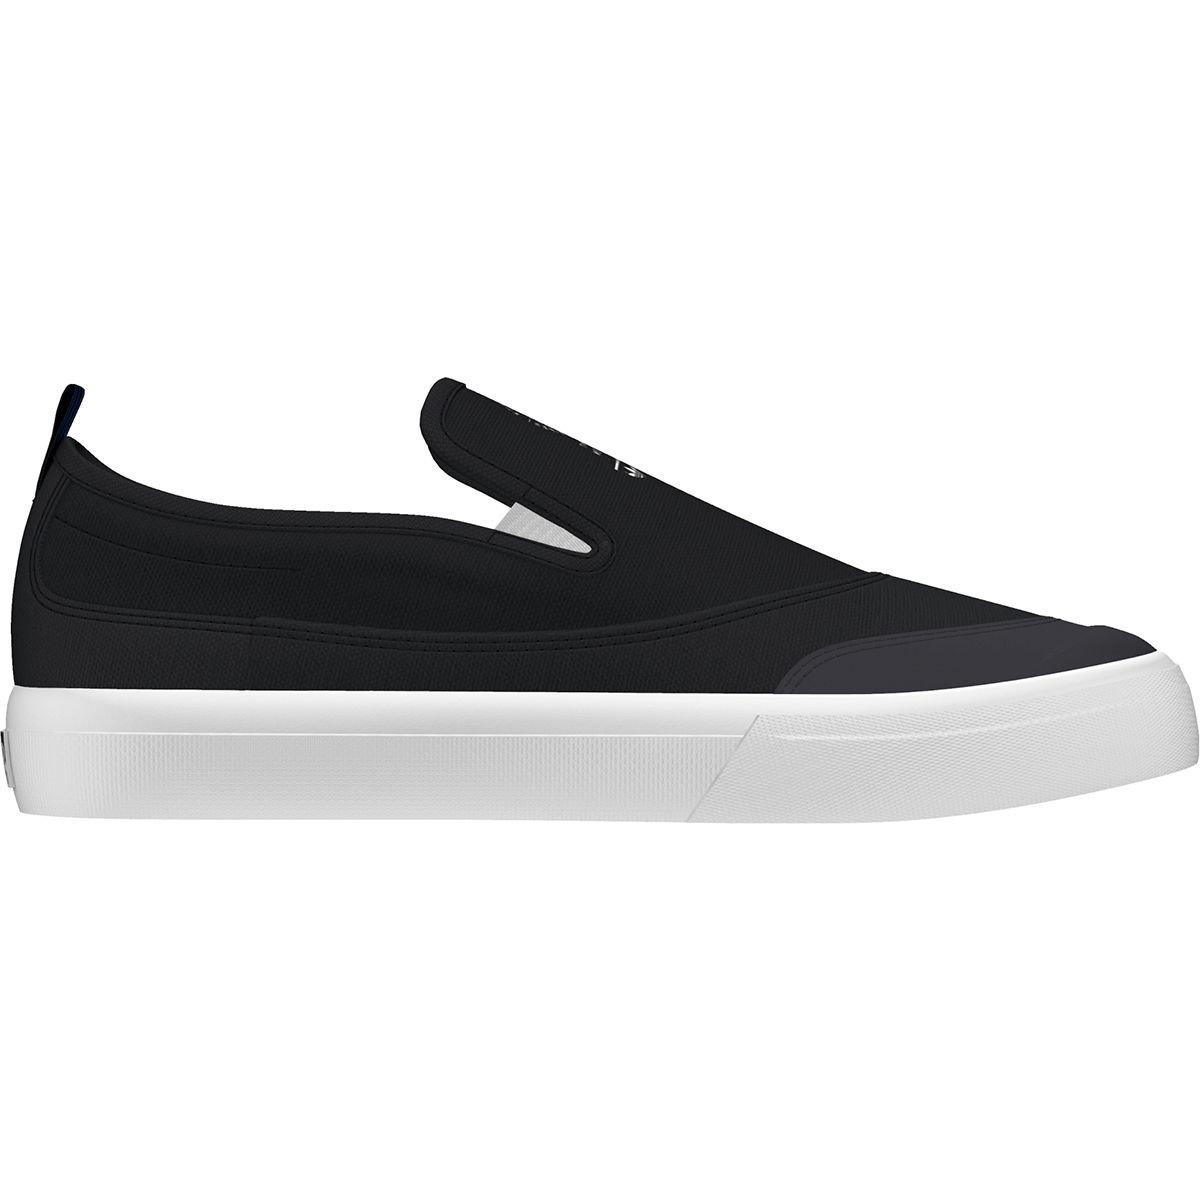 adidas Originals Men's Matchcourt Slip Skate Shoe 9 D(M) US Core Black/Footwear White/Gum